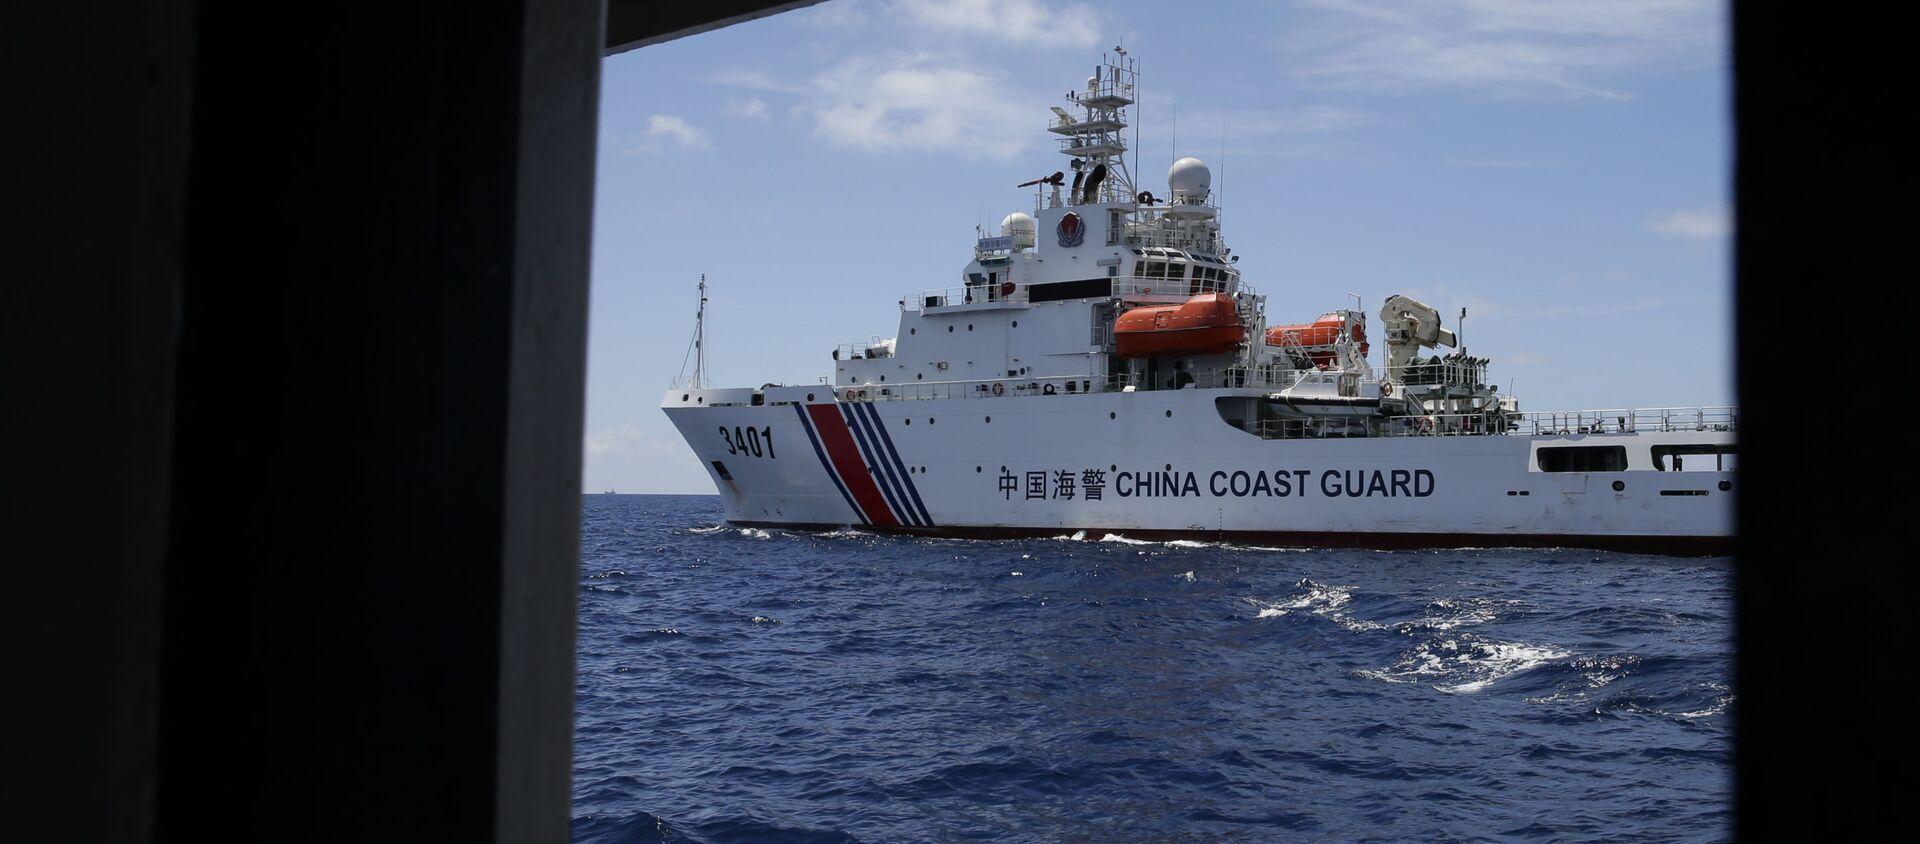 Chinese Coast Guard ship (File) - Sputnik International, 1920, 12.07.2021